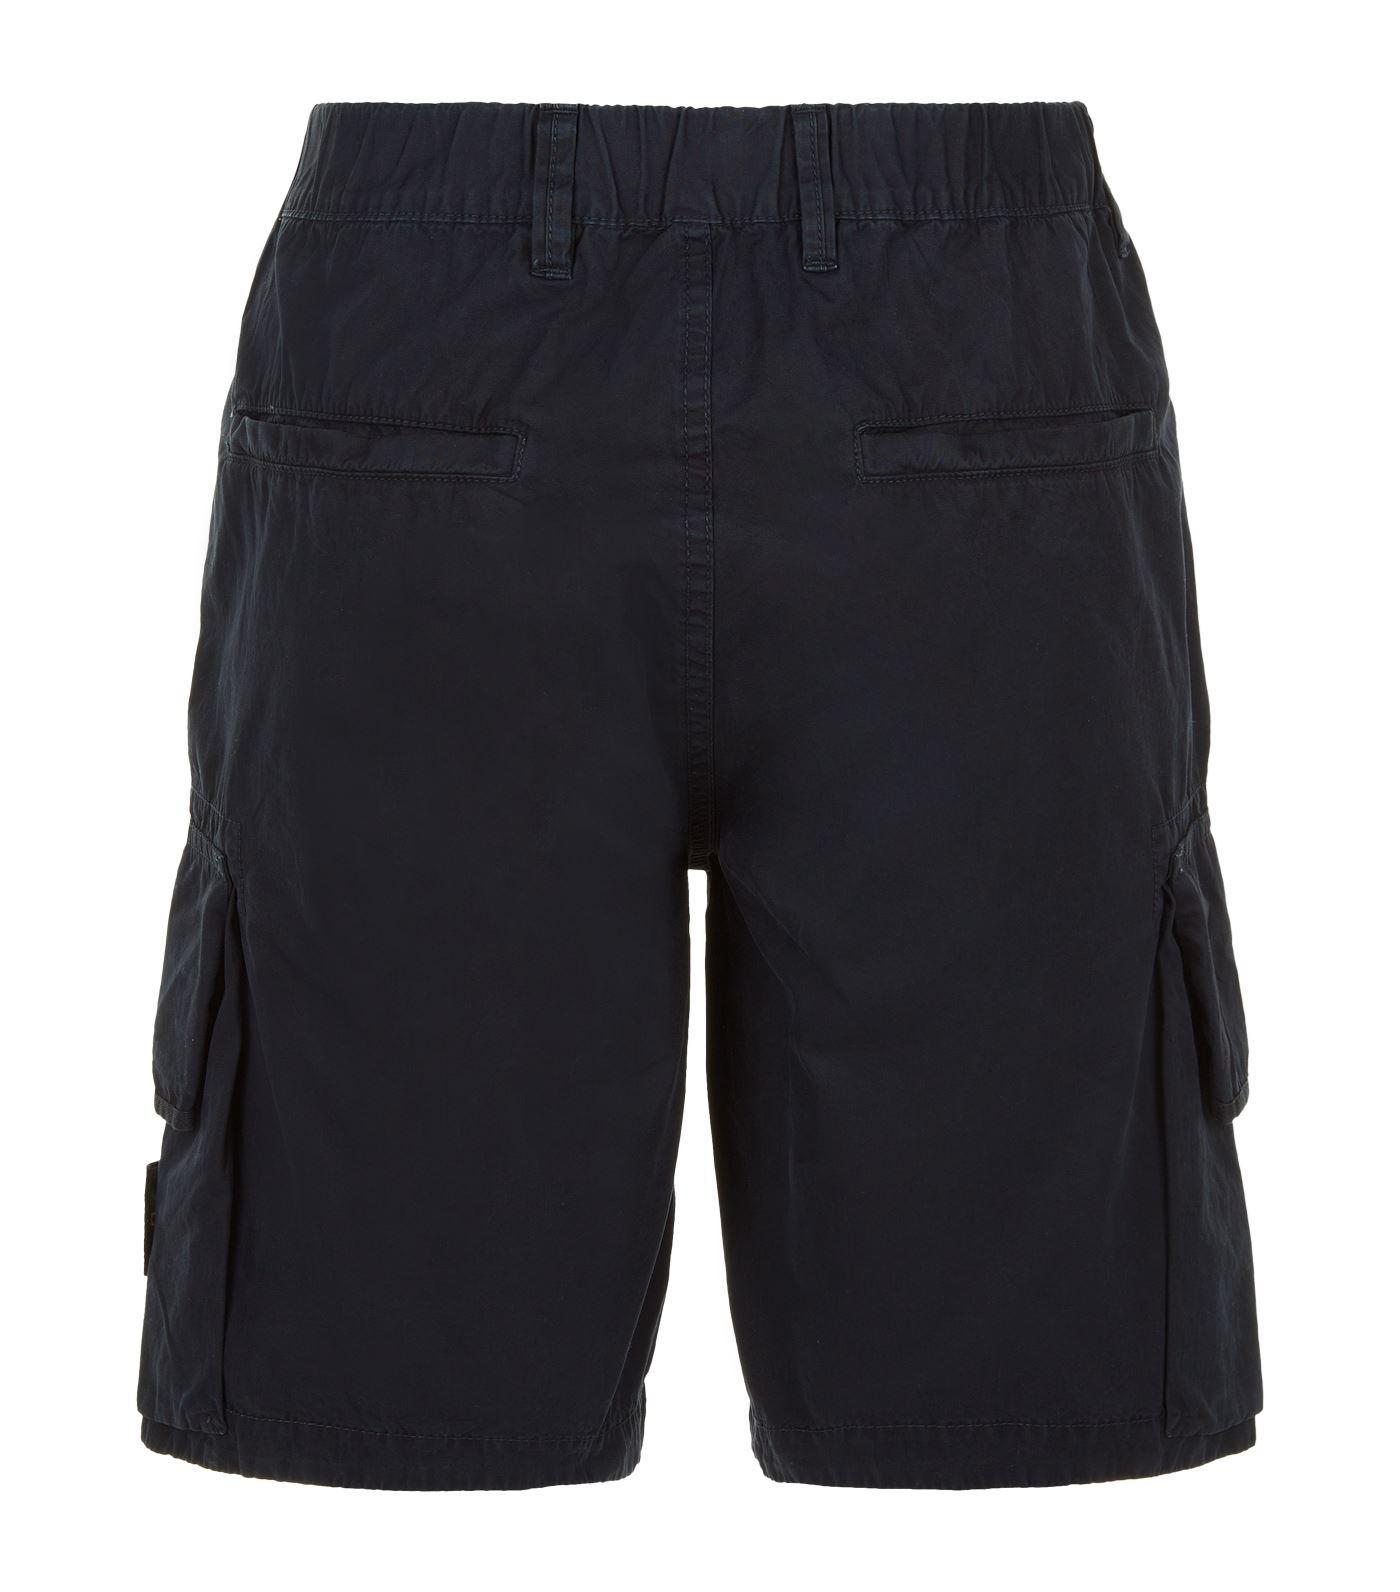 lyst stone island logo badge cargo shorts in blue for men. Black Bedroom Furniture Sets. Home Design Ideas